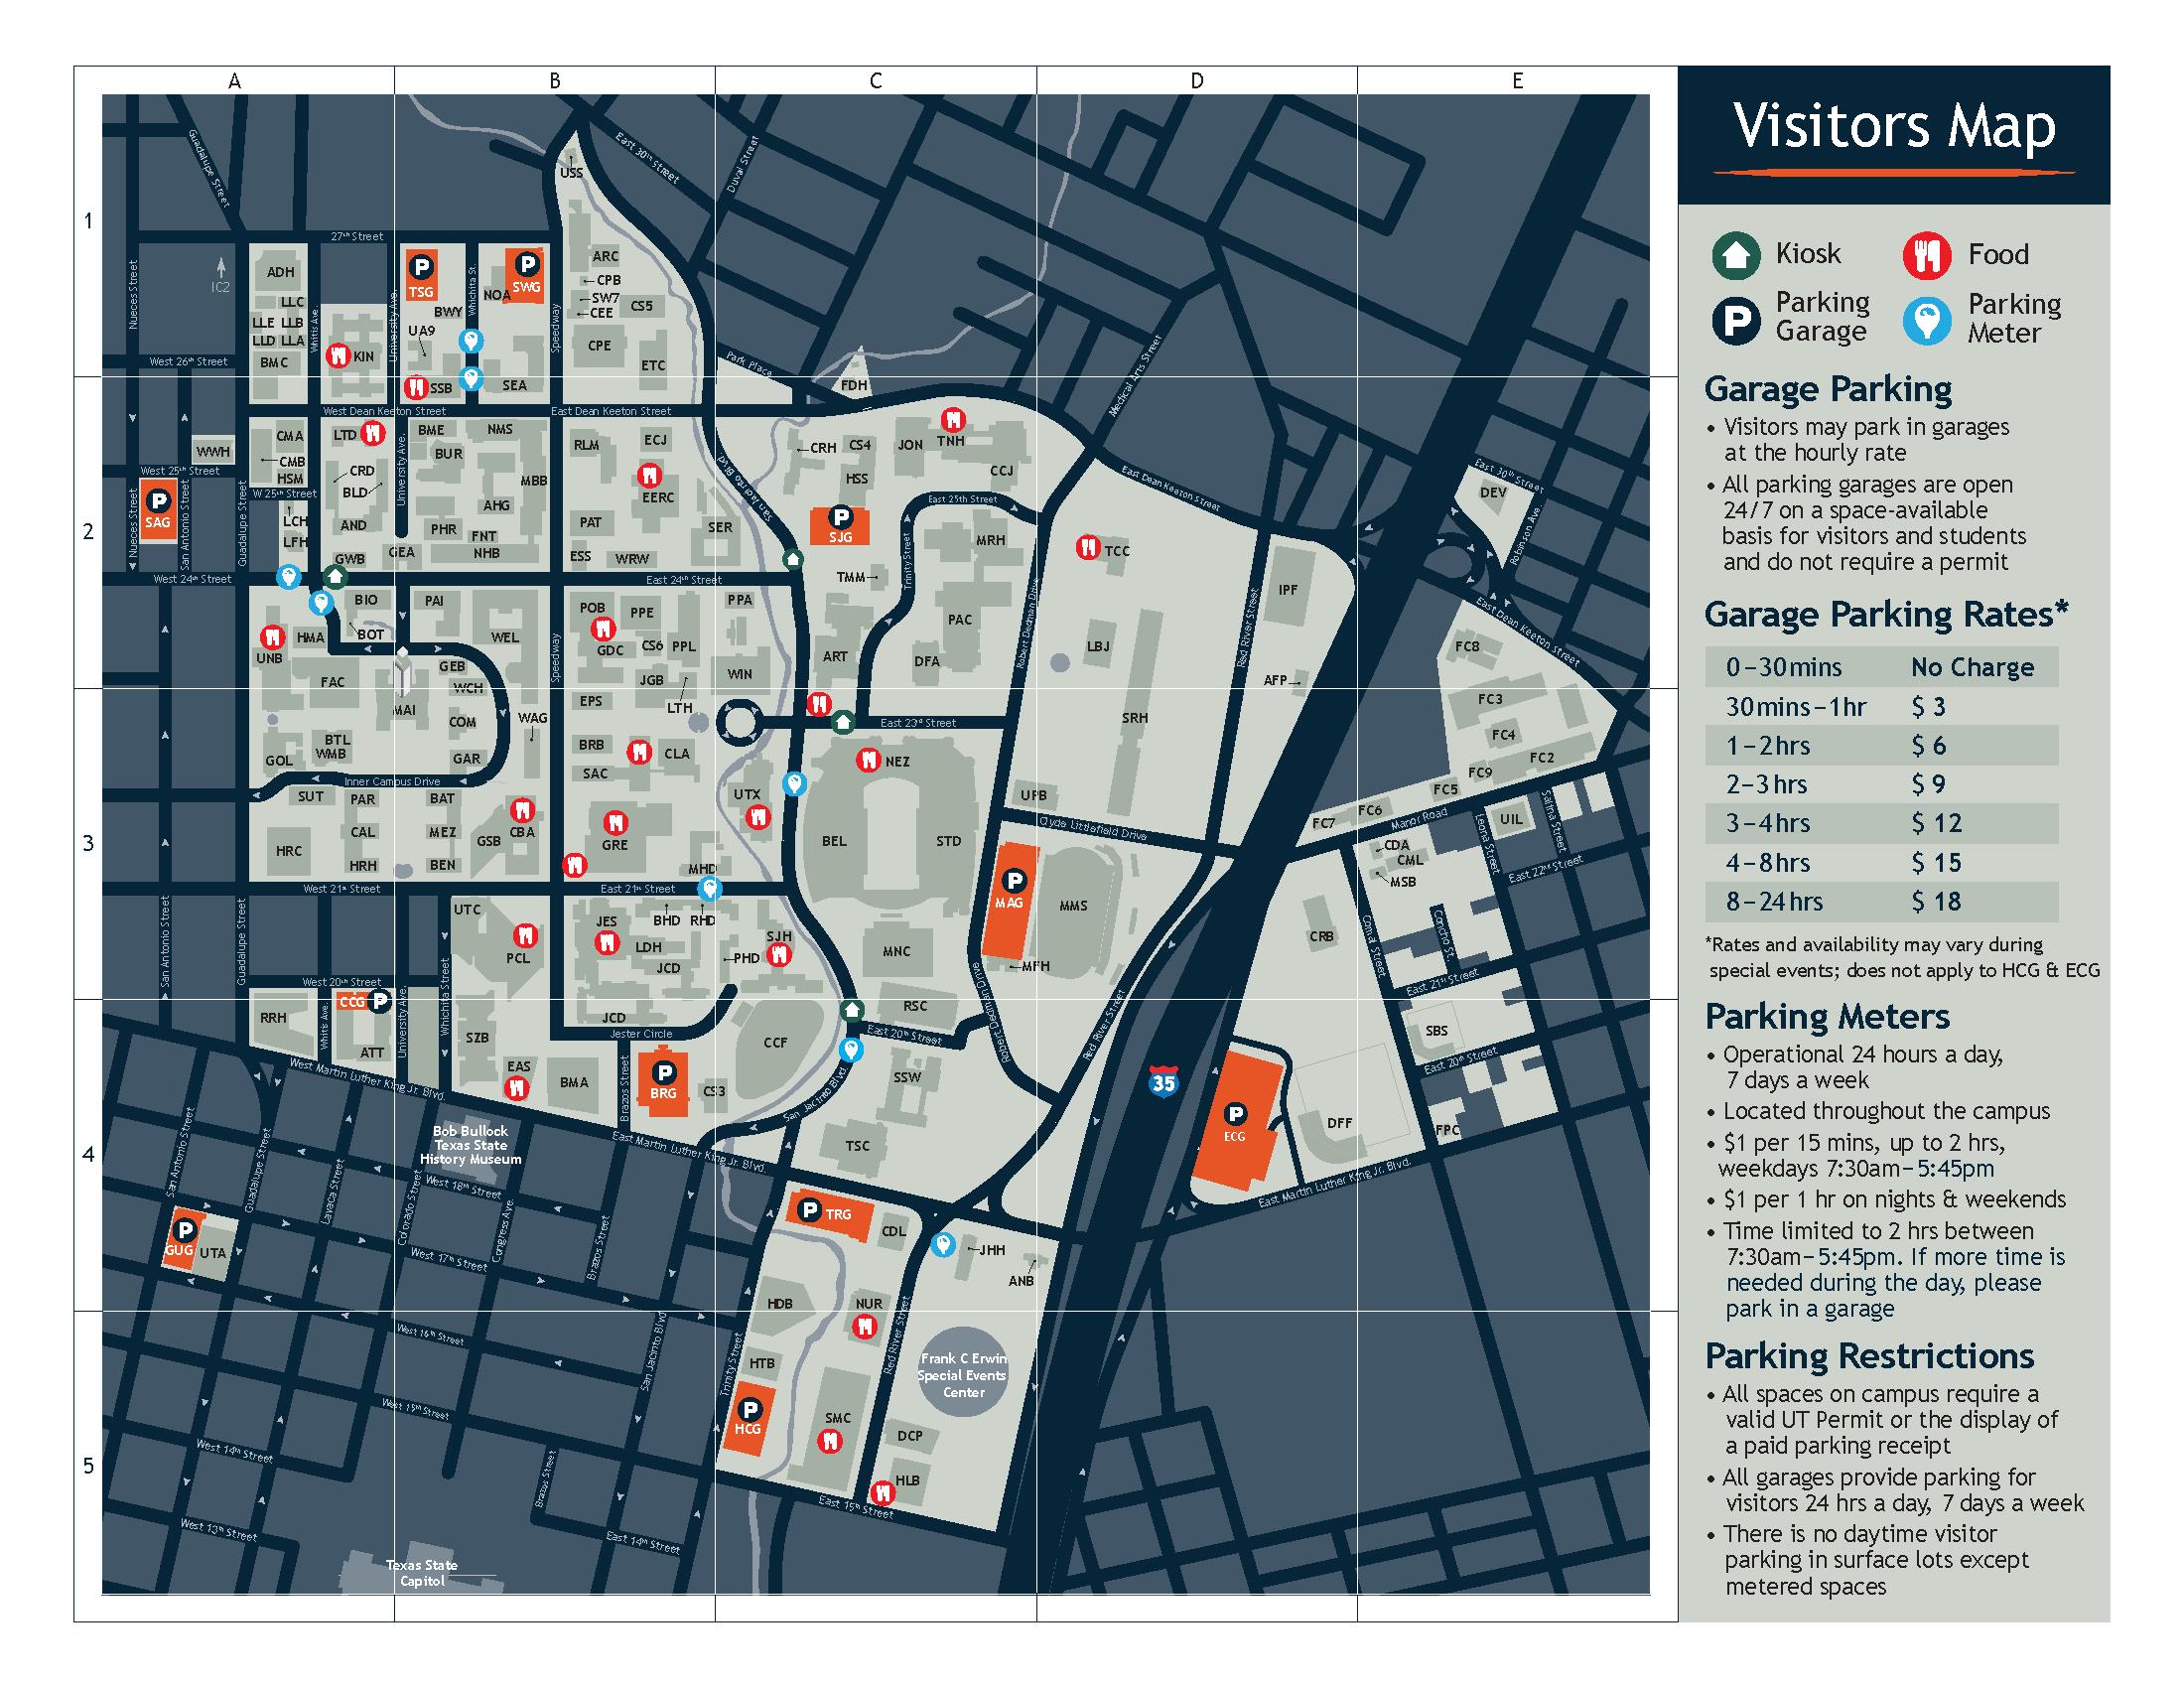 Visitors Parking Map